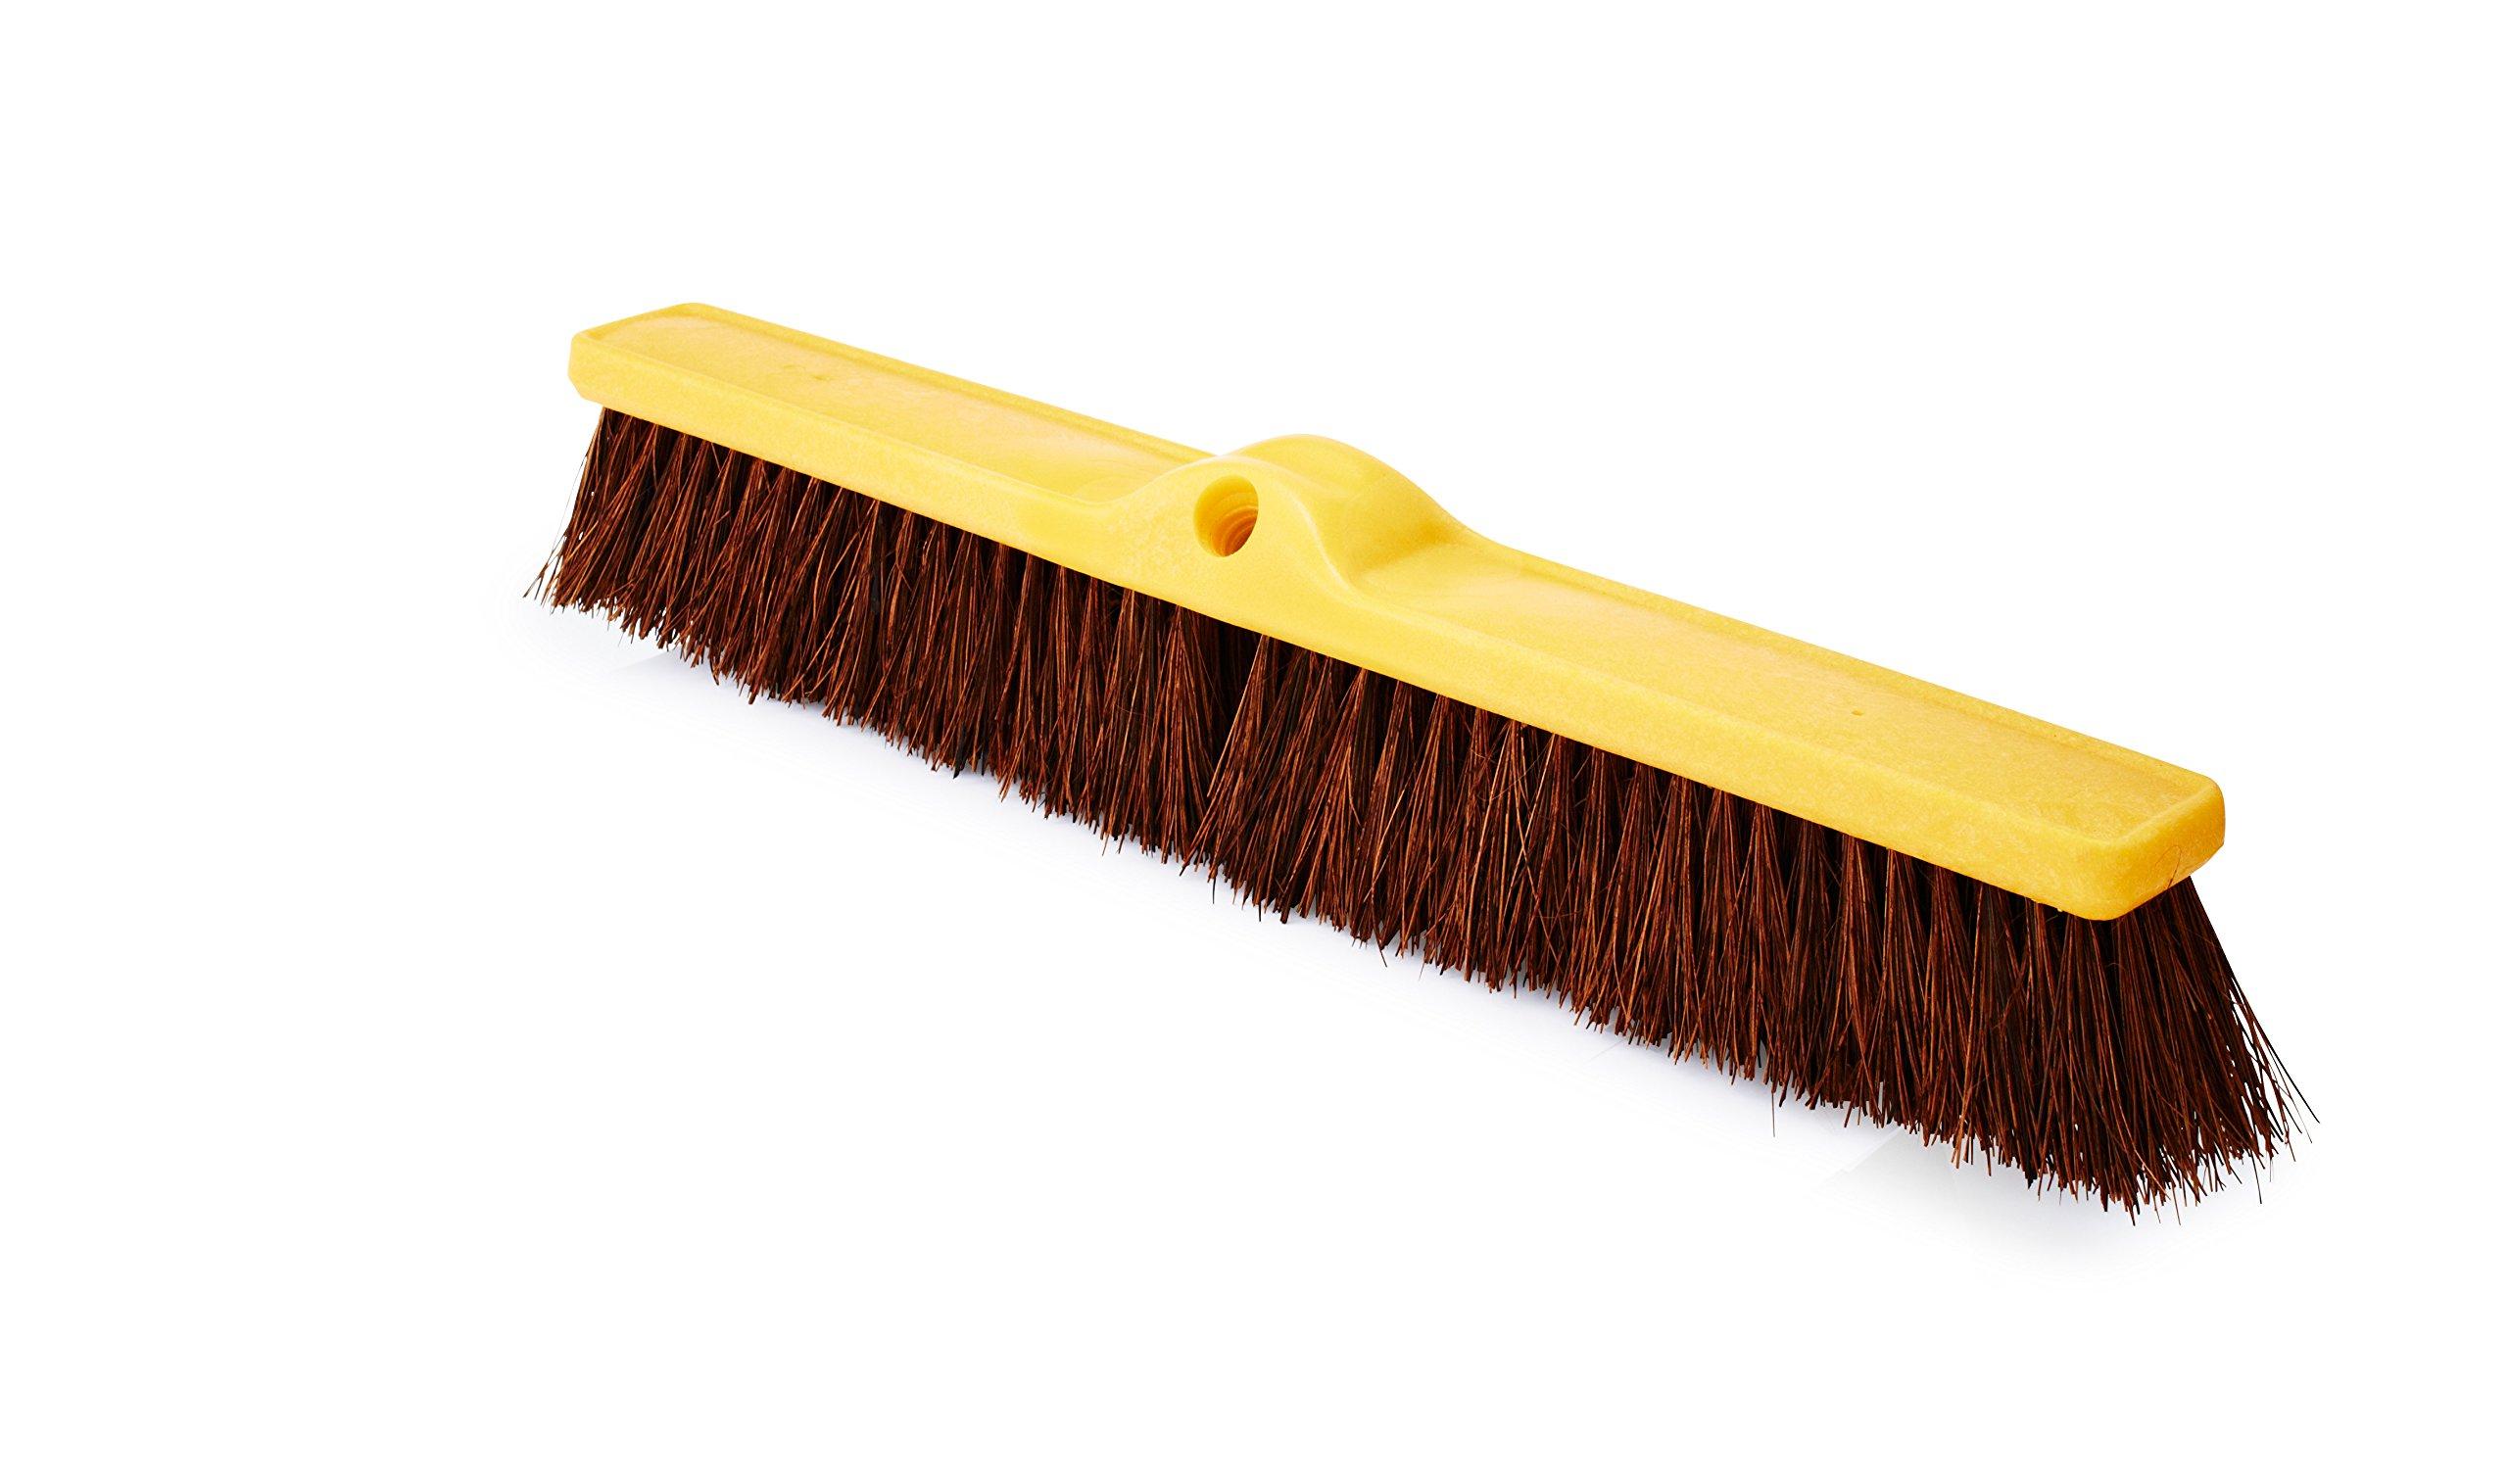 Rubbermaid Commercial Fine Floor Sweep, Palmyra, Plastic Broom Head, 24'', FG9B1800BRN